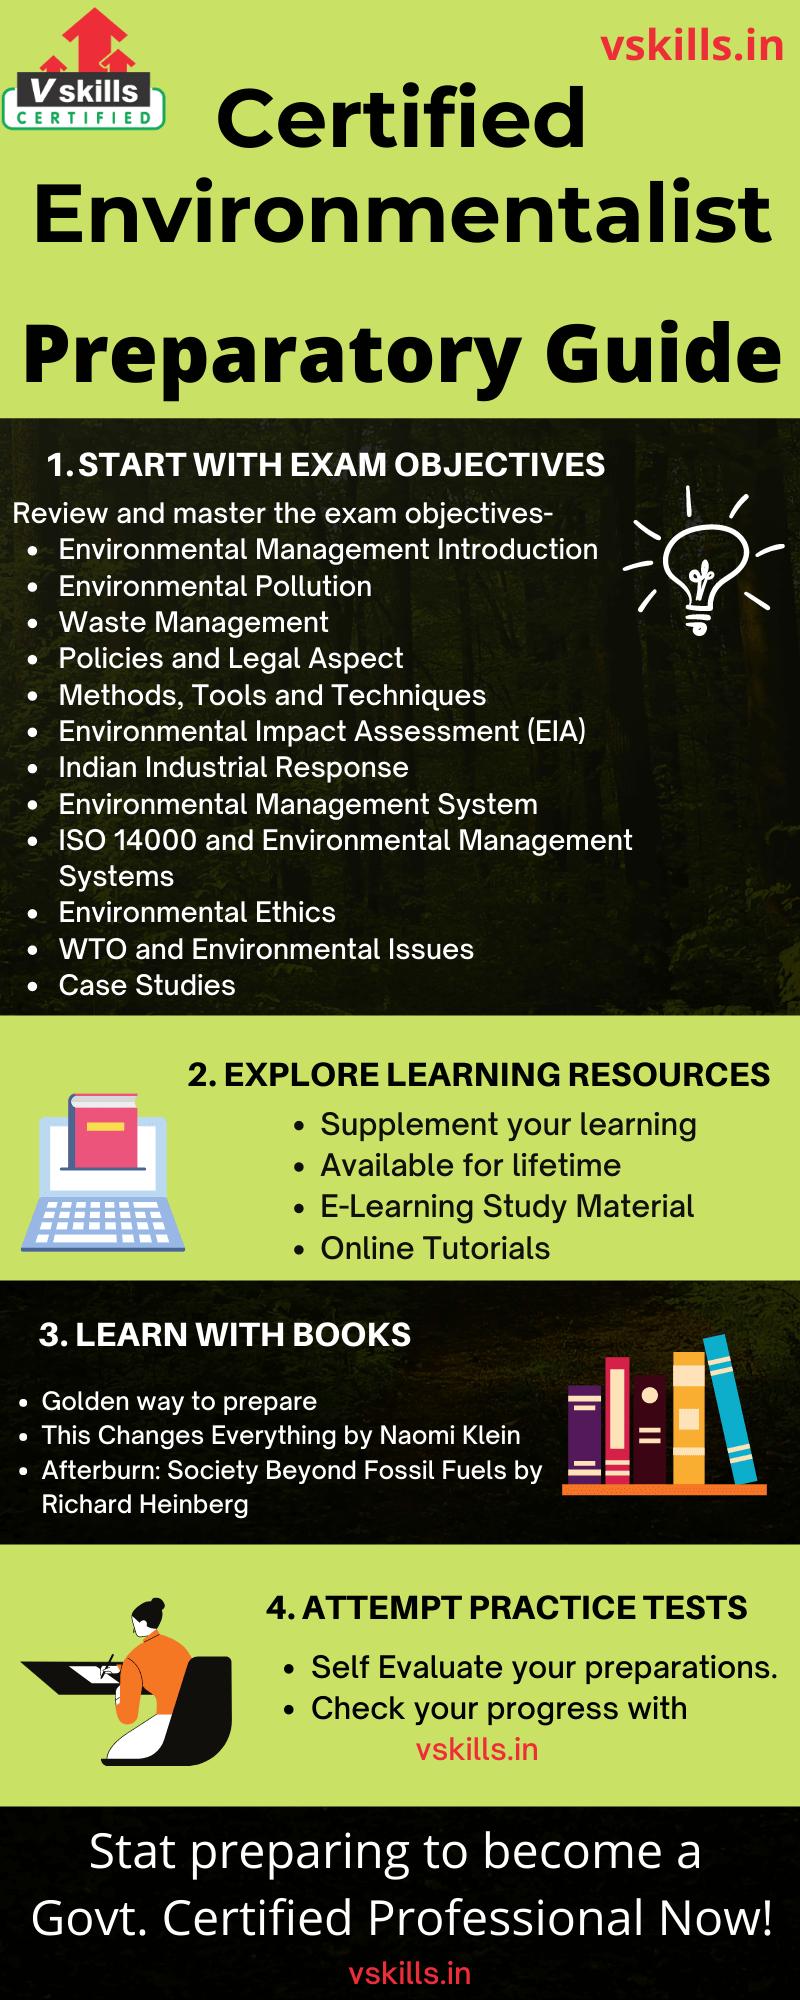 Certified Environmentalist preparatory guide